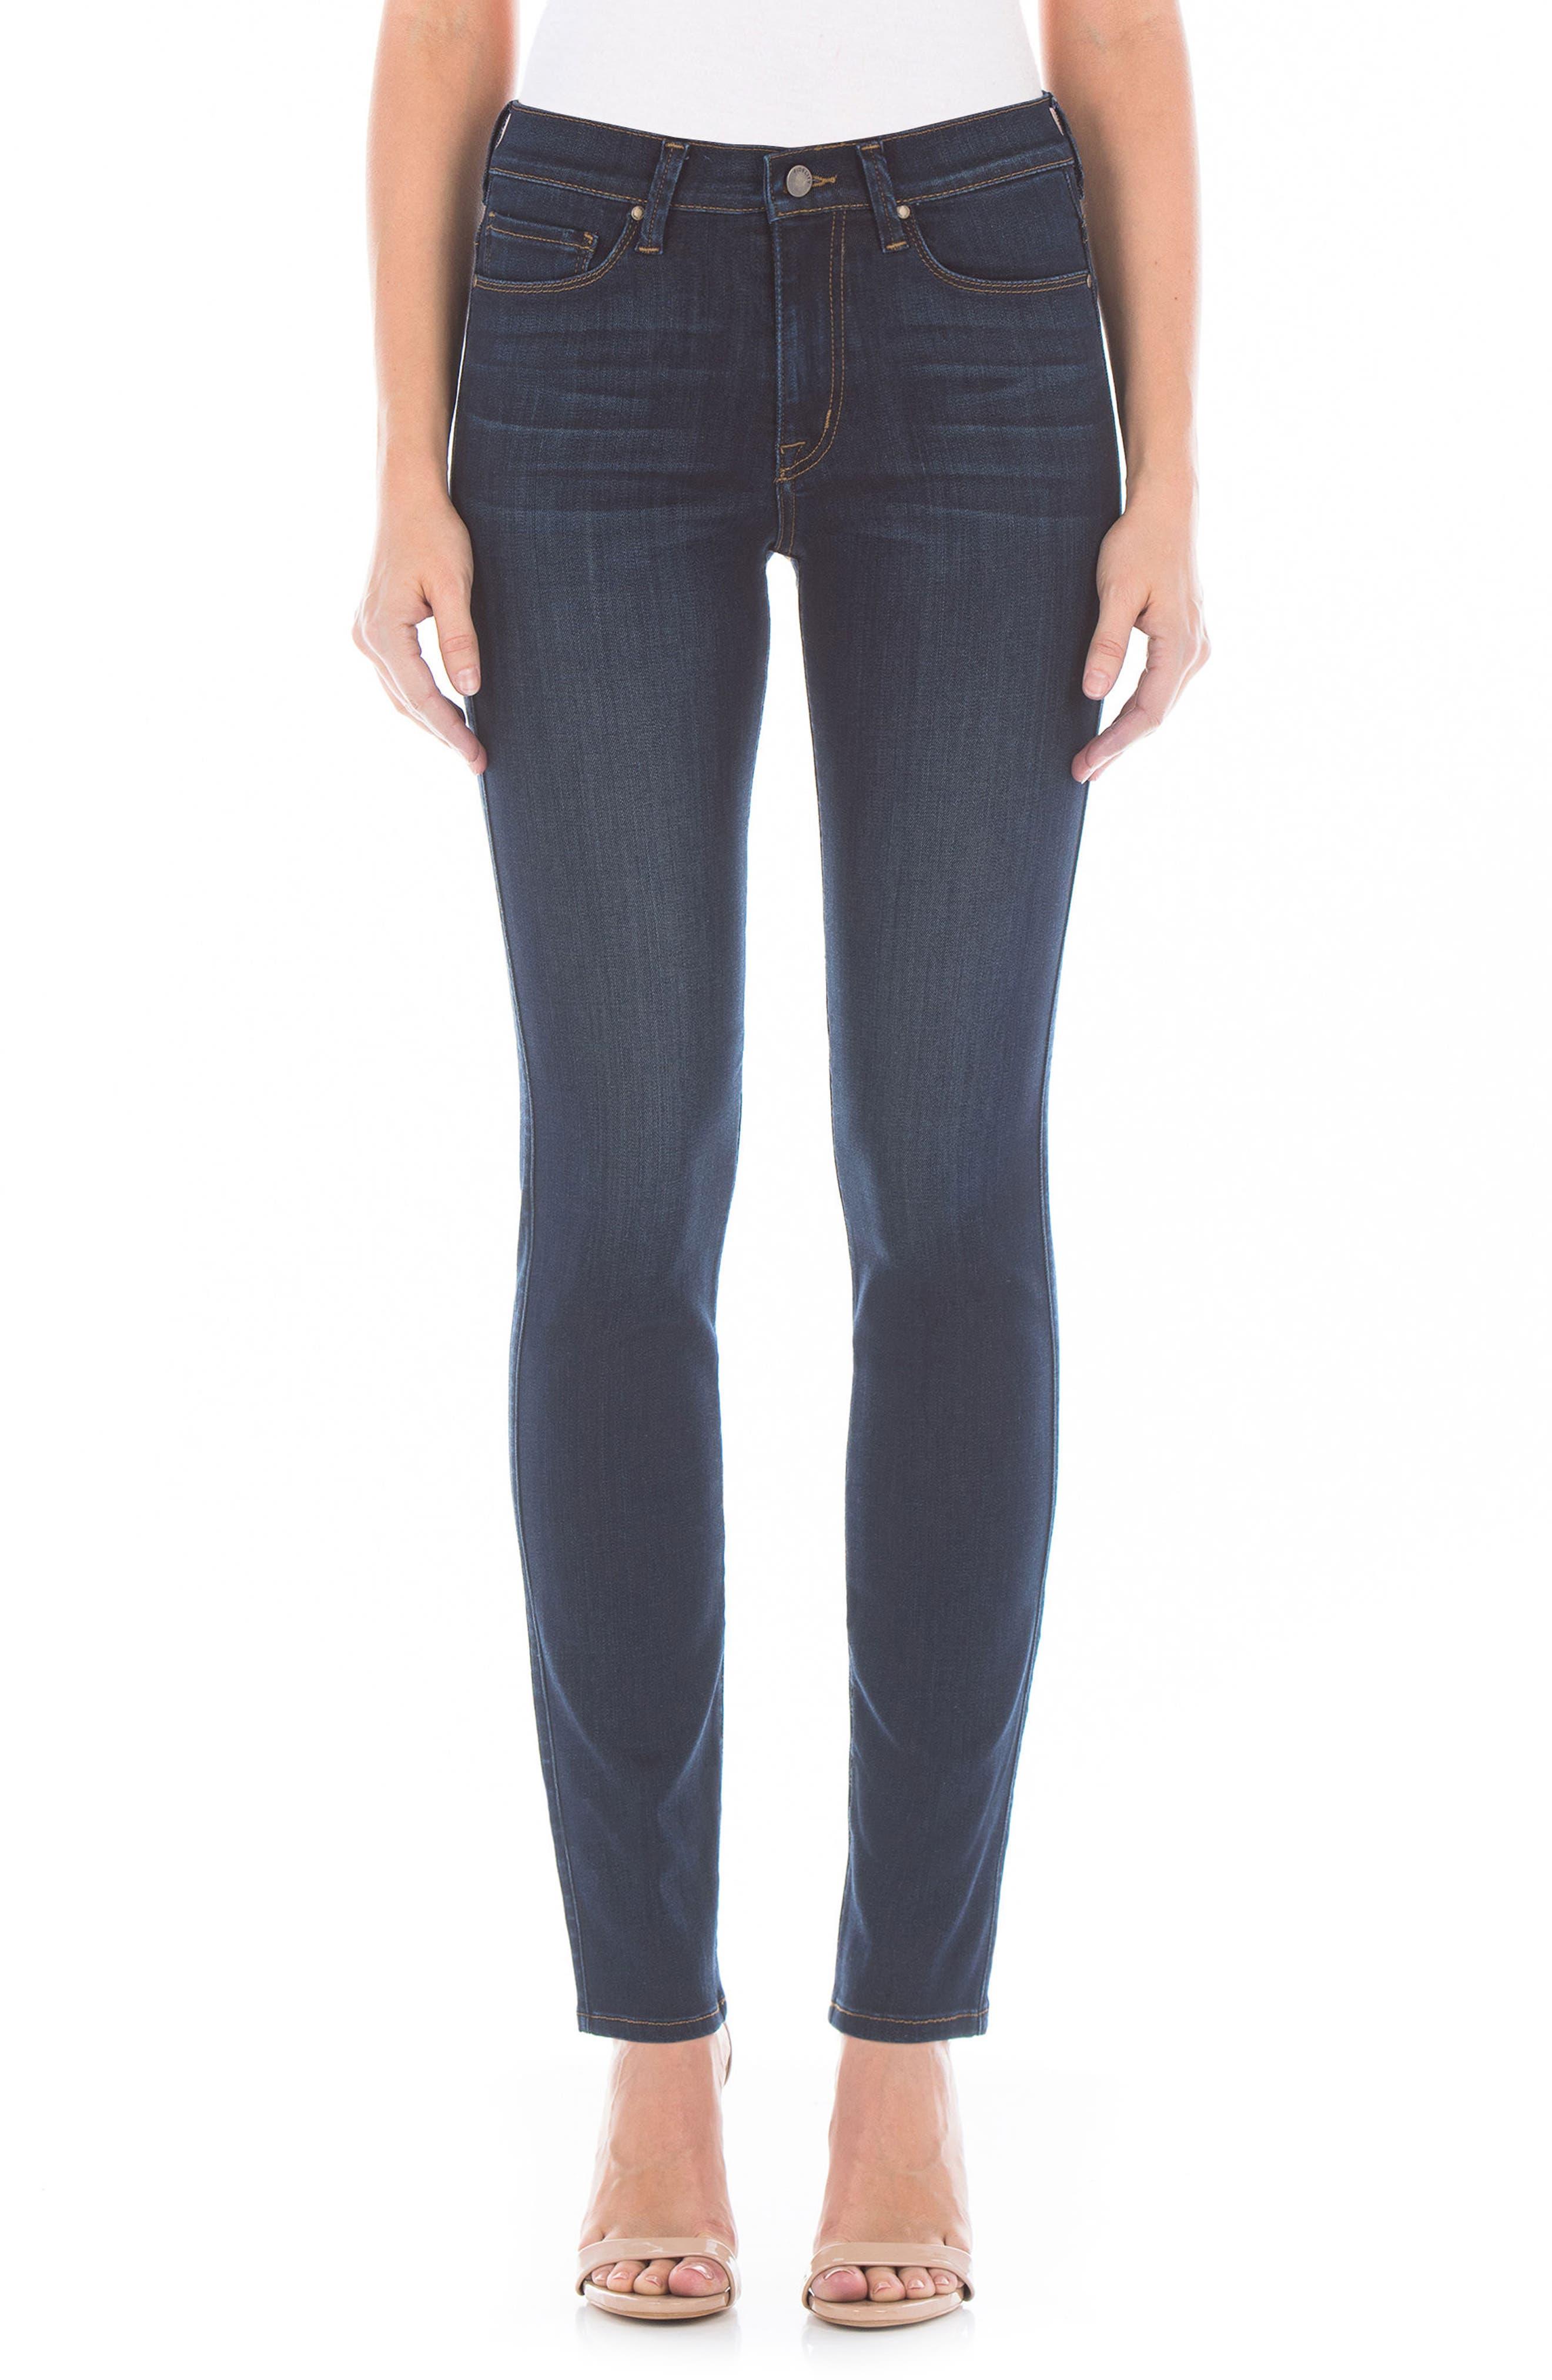 FIDELITY DENIM Cher High Waist Slim Jeans, Main, color, 400